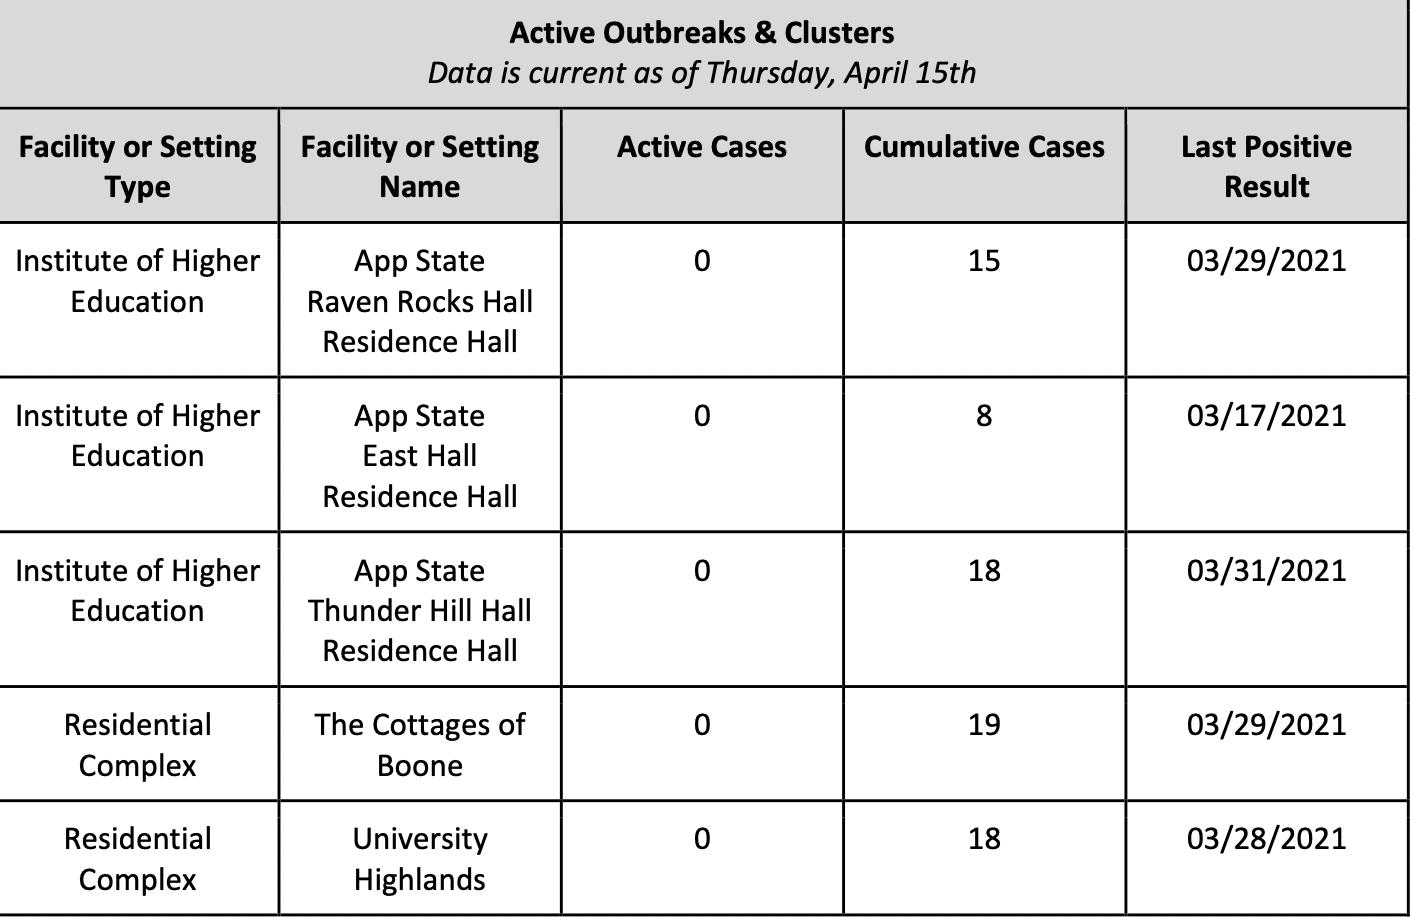 Monday April 19, 2021 - Appalachian State, Watauga, Alleghany, Ashe COVID-19 Cases & Vaccine Data